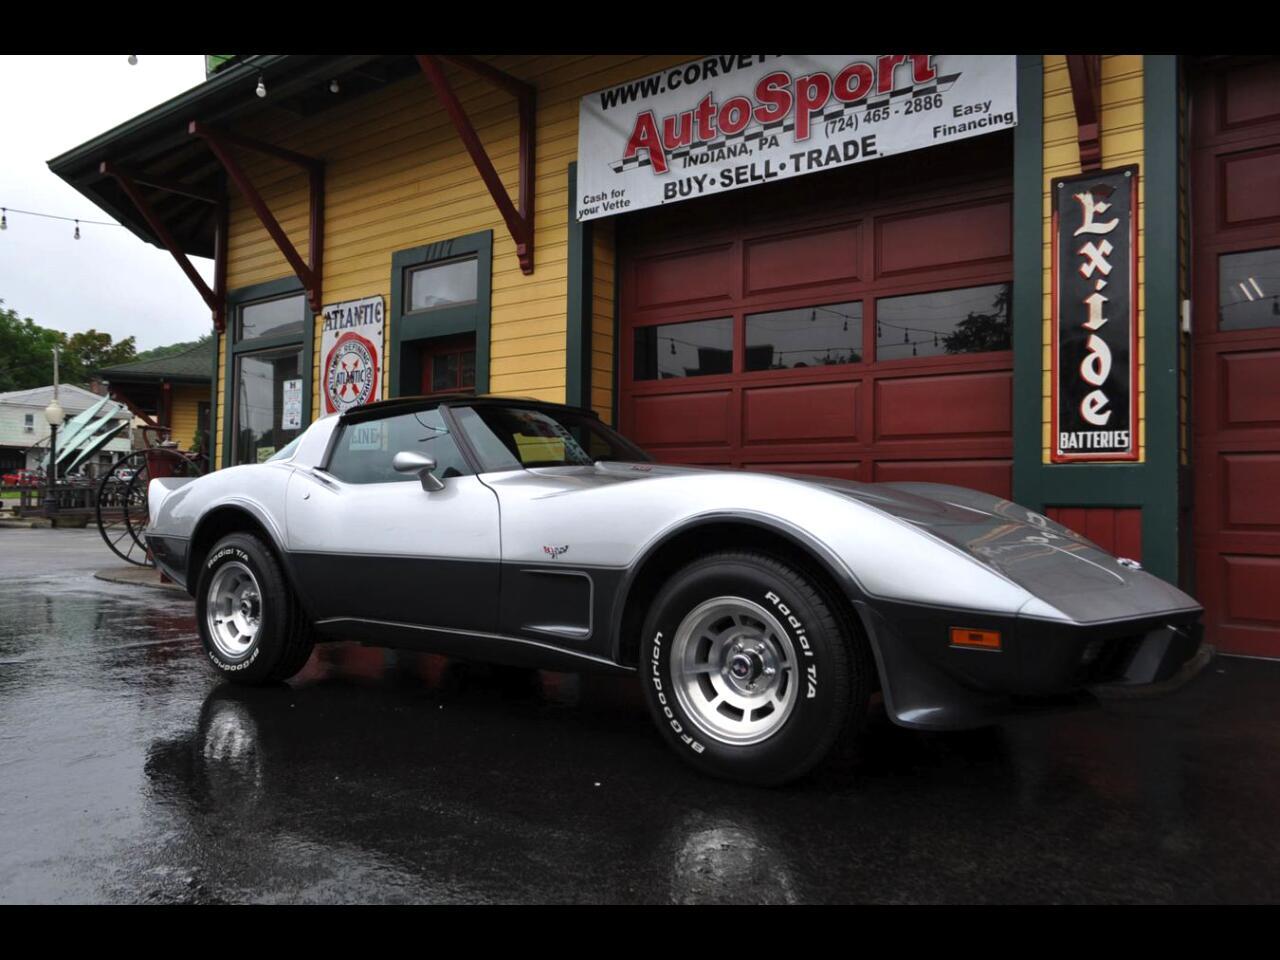 1978 Chevrolet Corvette 1978 L82 4 Speed Silver Anniversary Corvette!